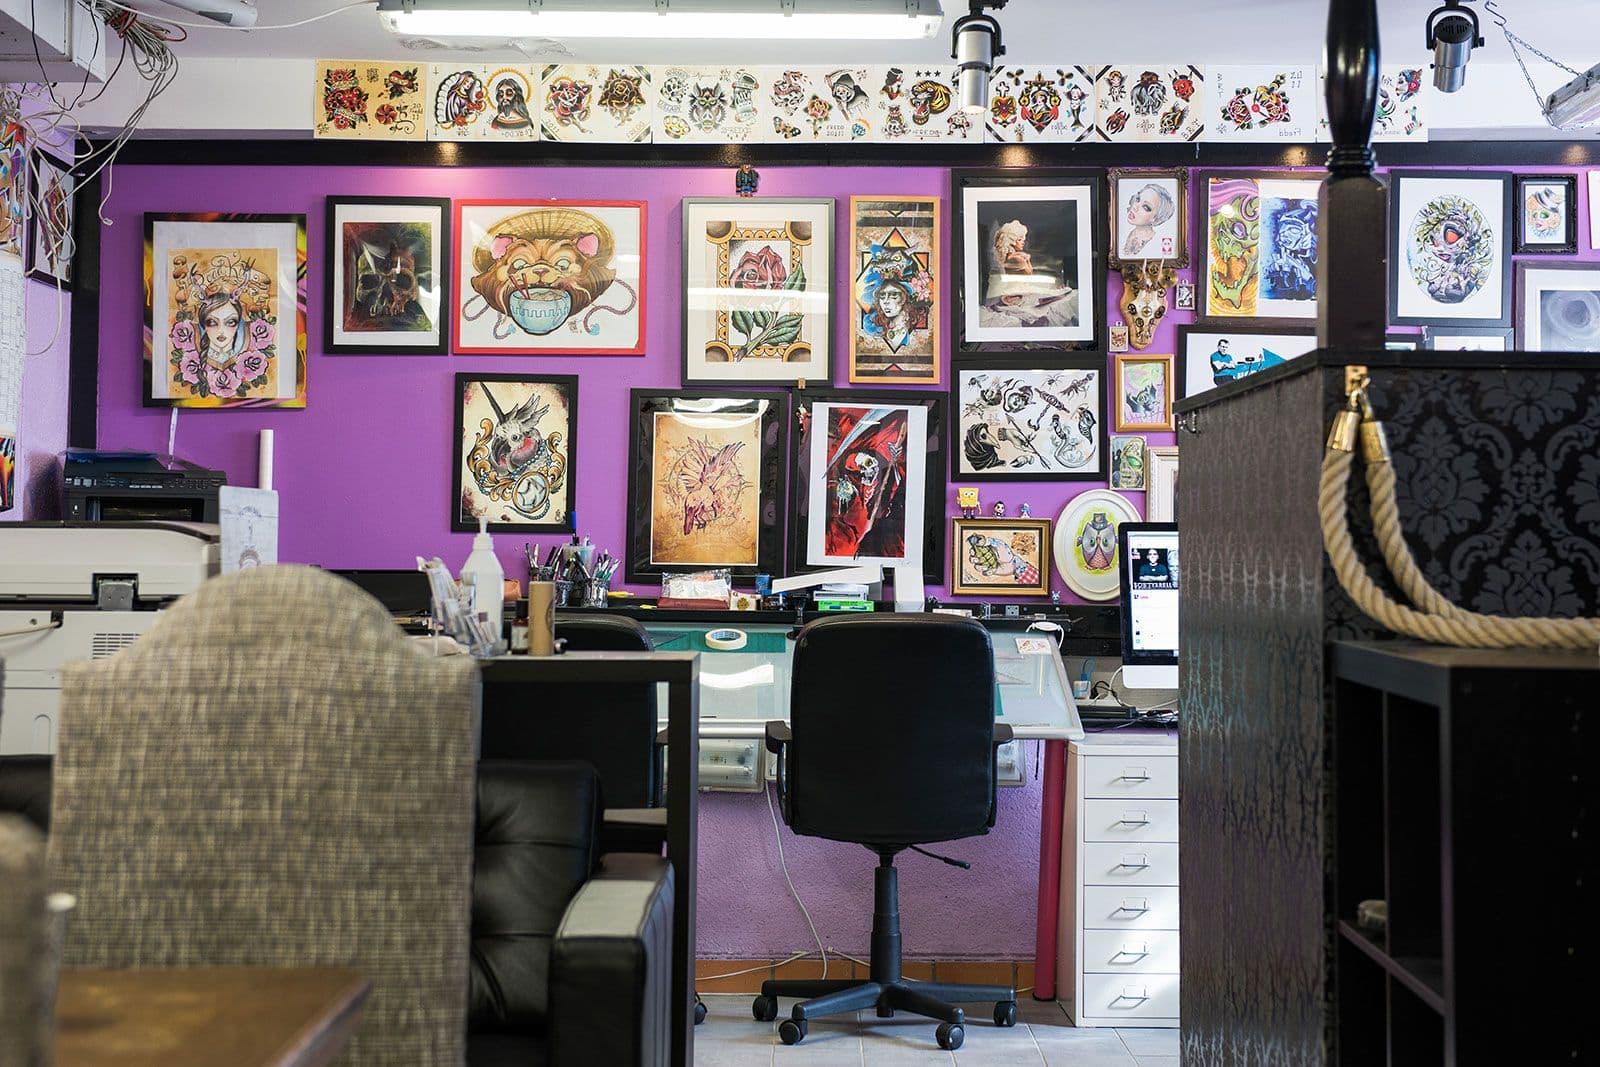 tatueringar fusk doggy stil i Göteborg